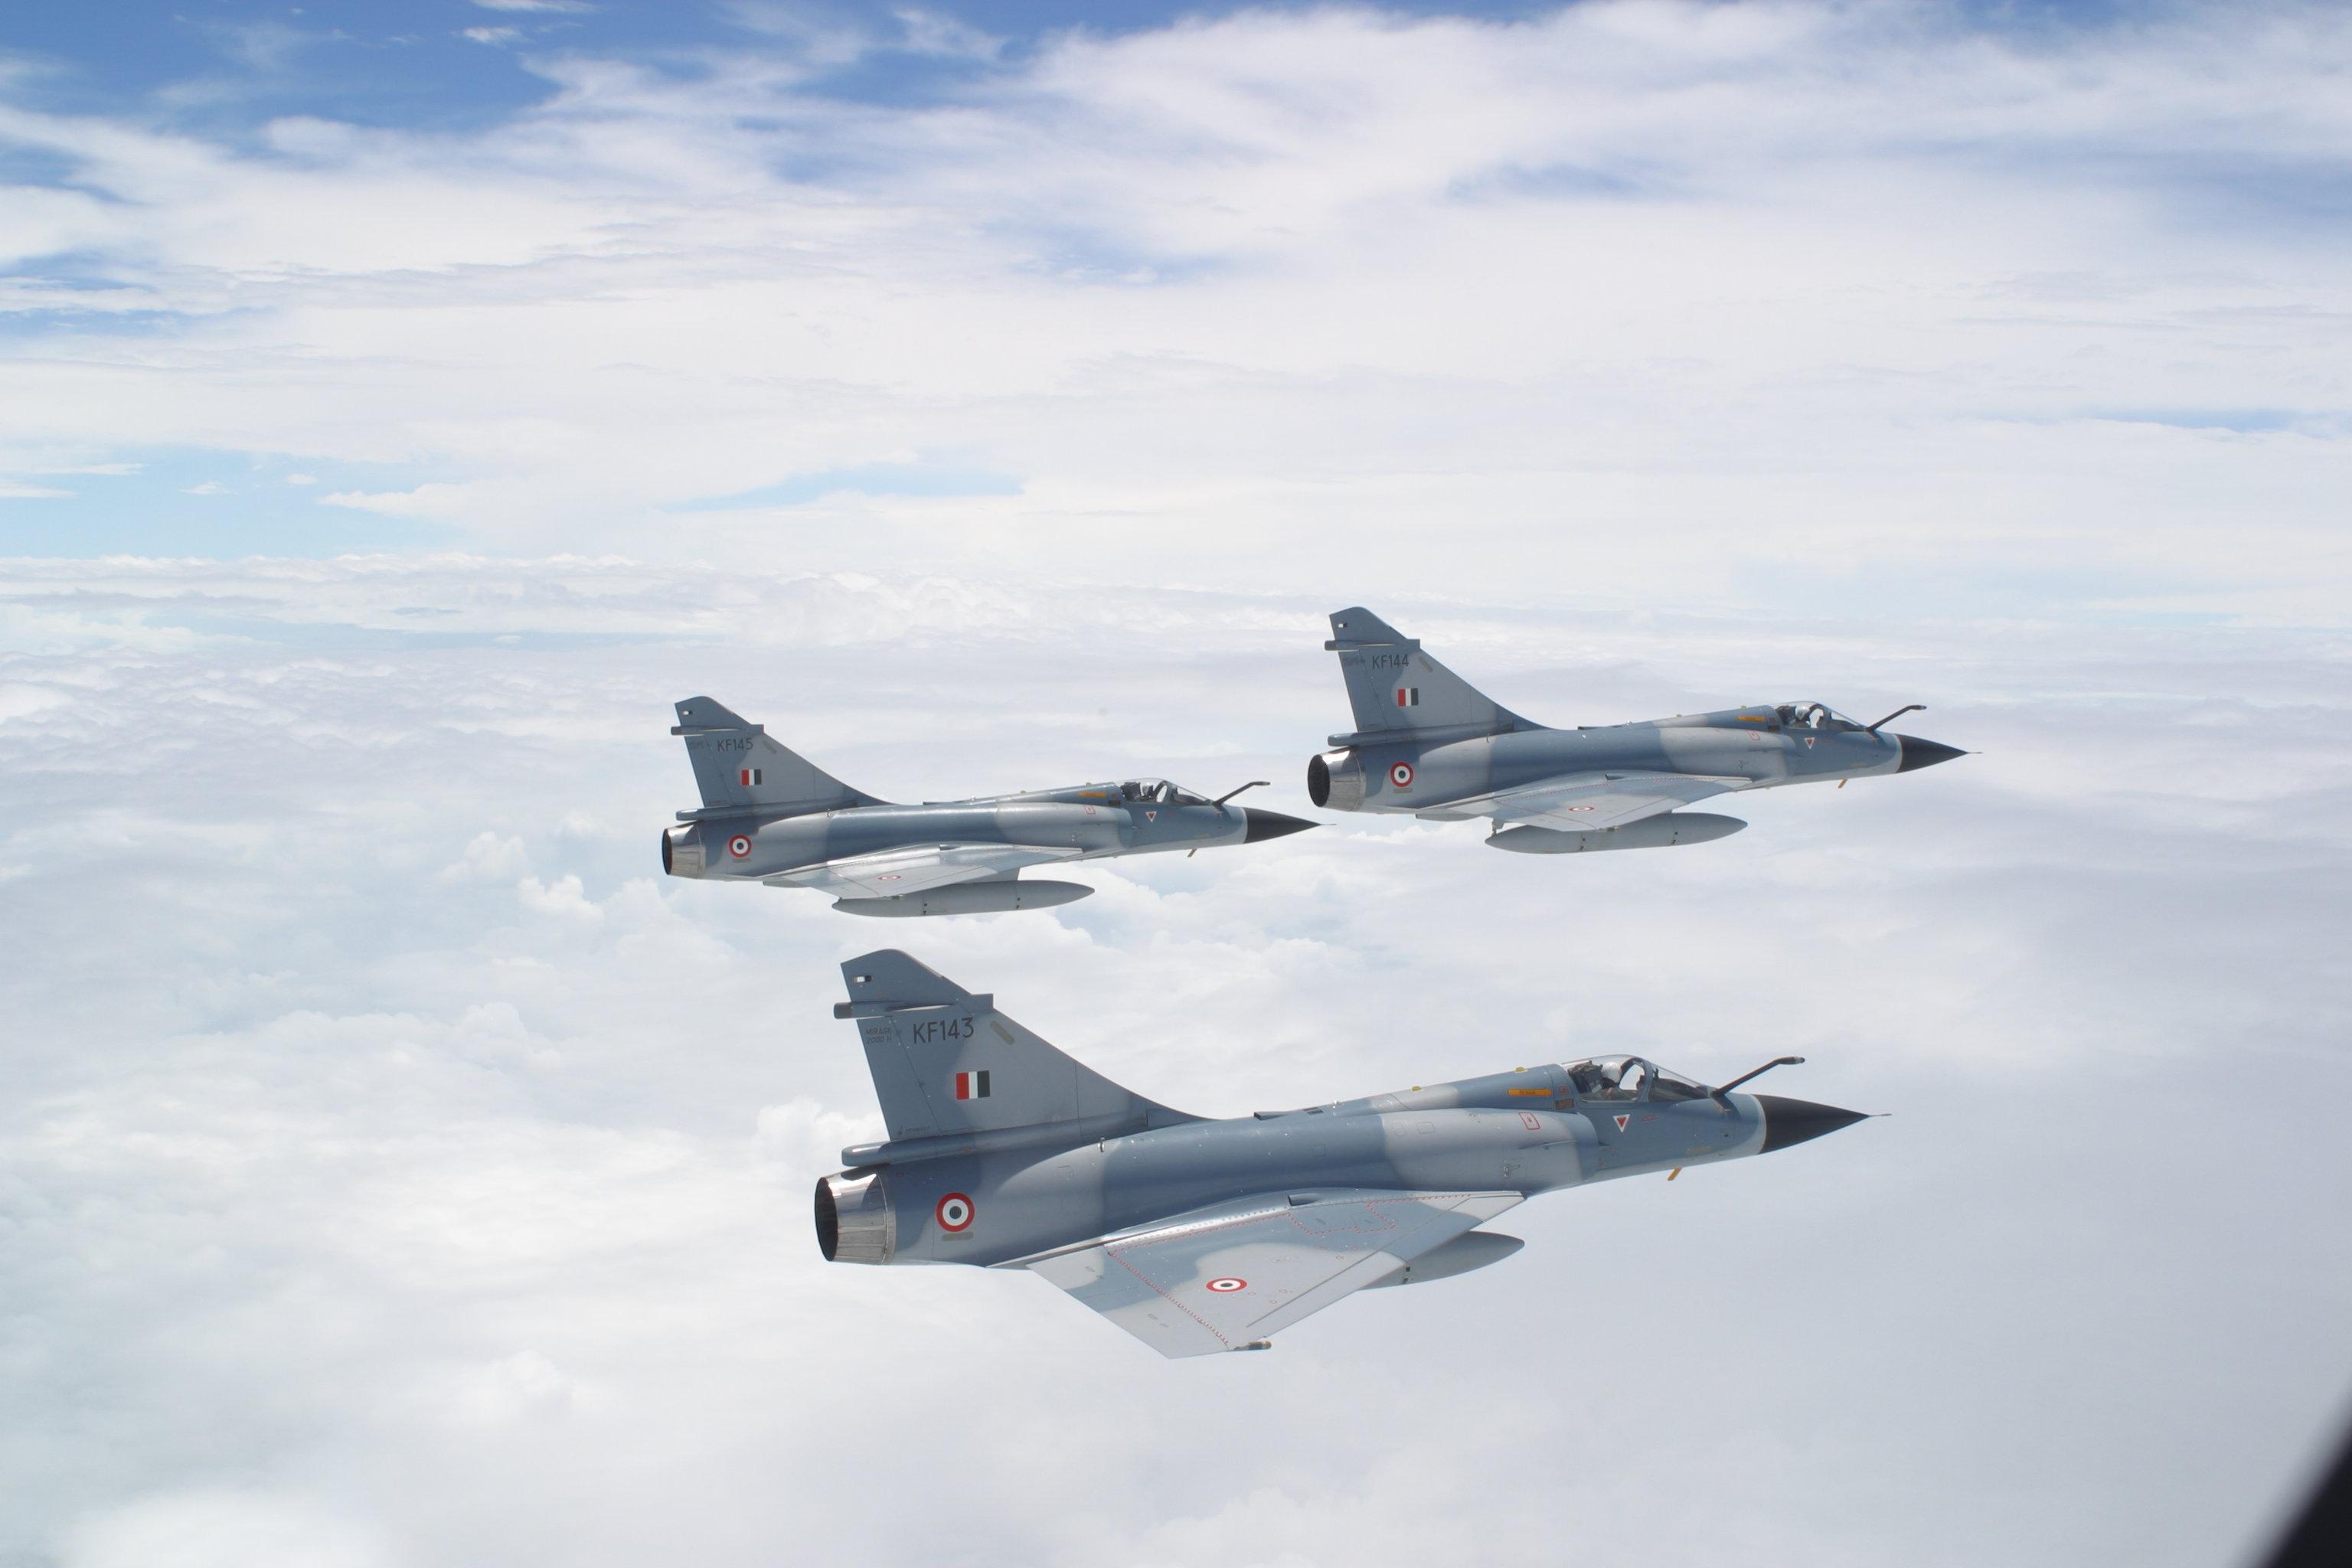 Dassault Mirage 2000 Fondo De Pantalla Hd Fondo De